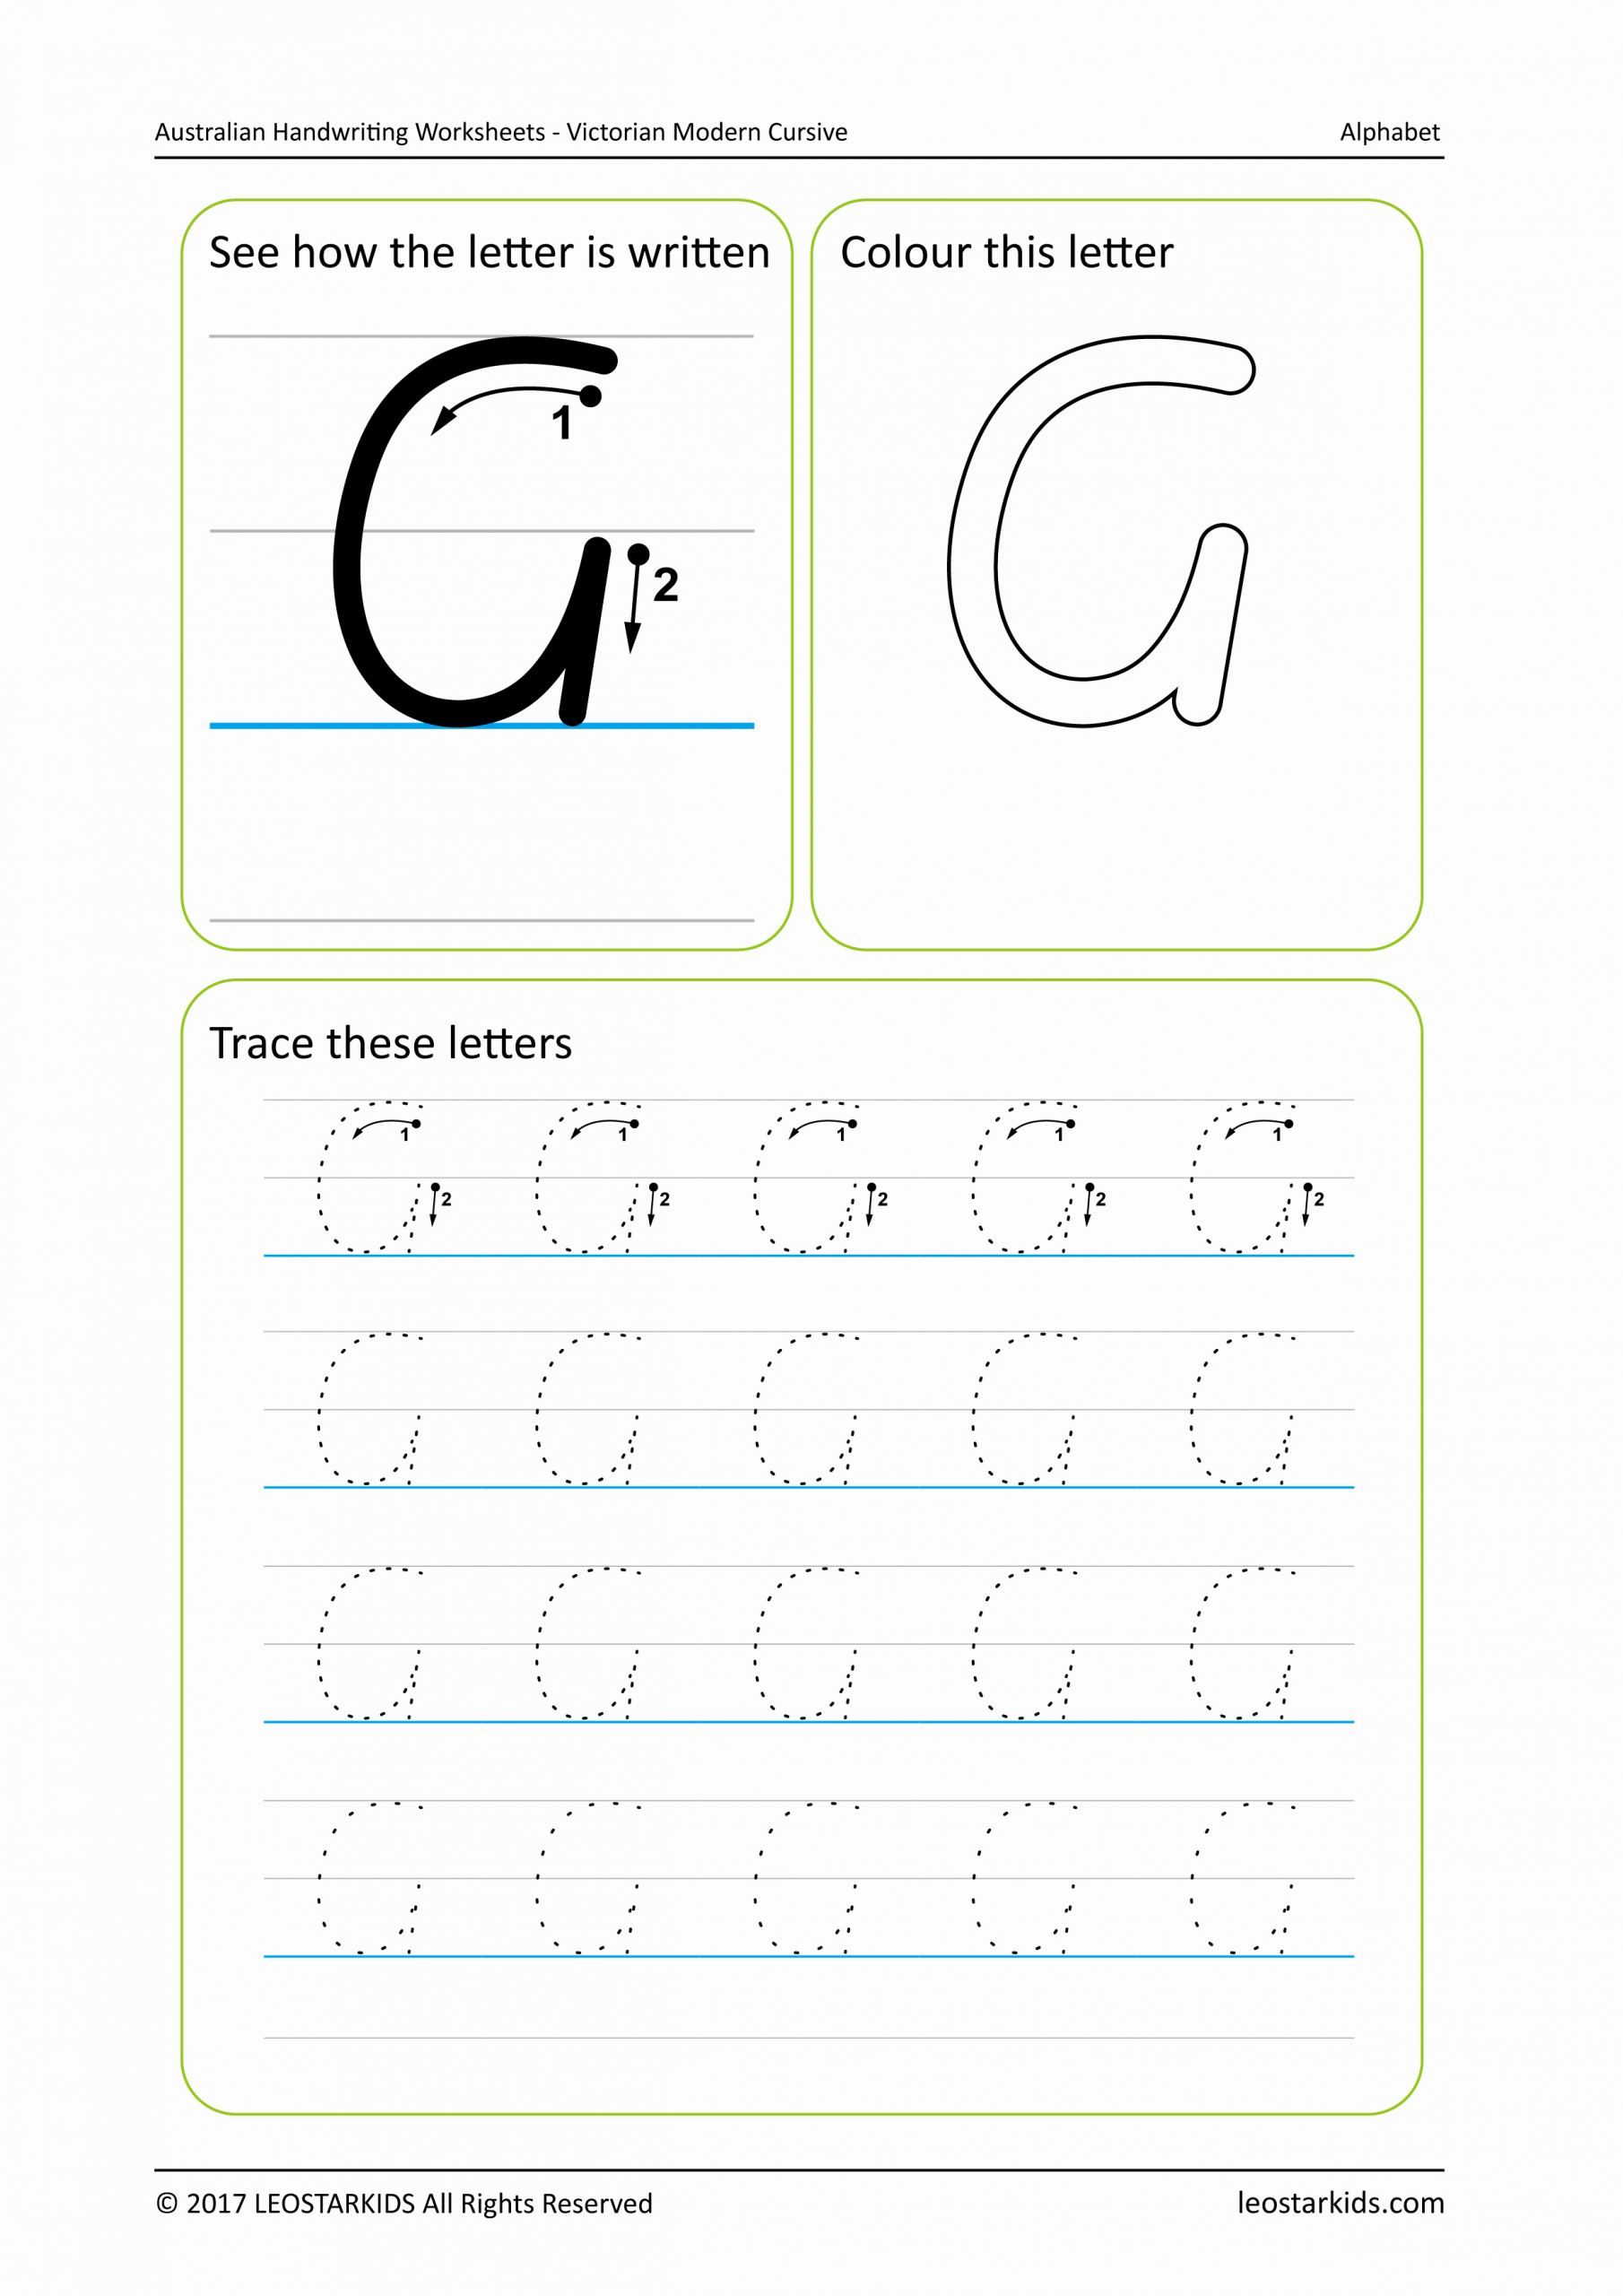 Alphabet Tracing Worksheets Pdf Luxury Alphabets Tracing Worksheets Filetype Pdf